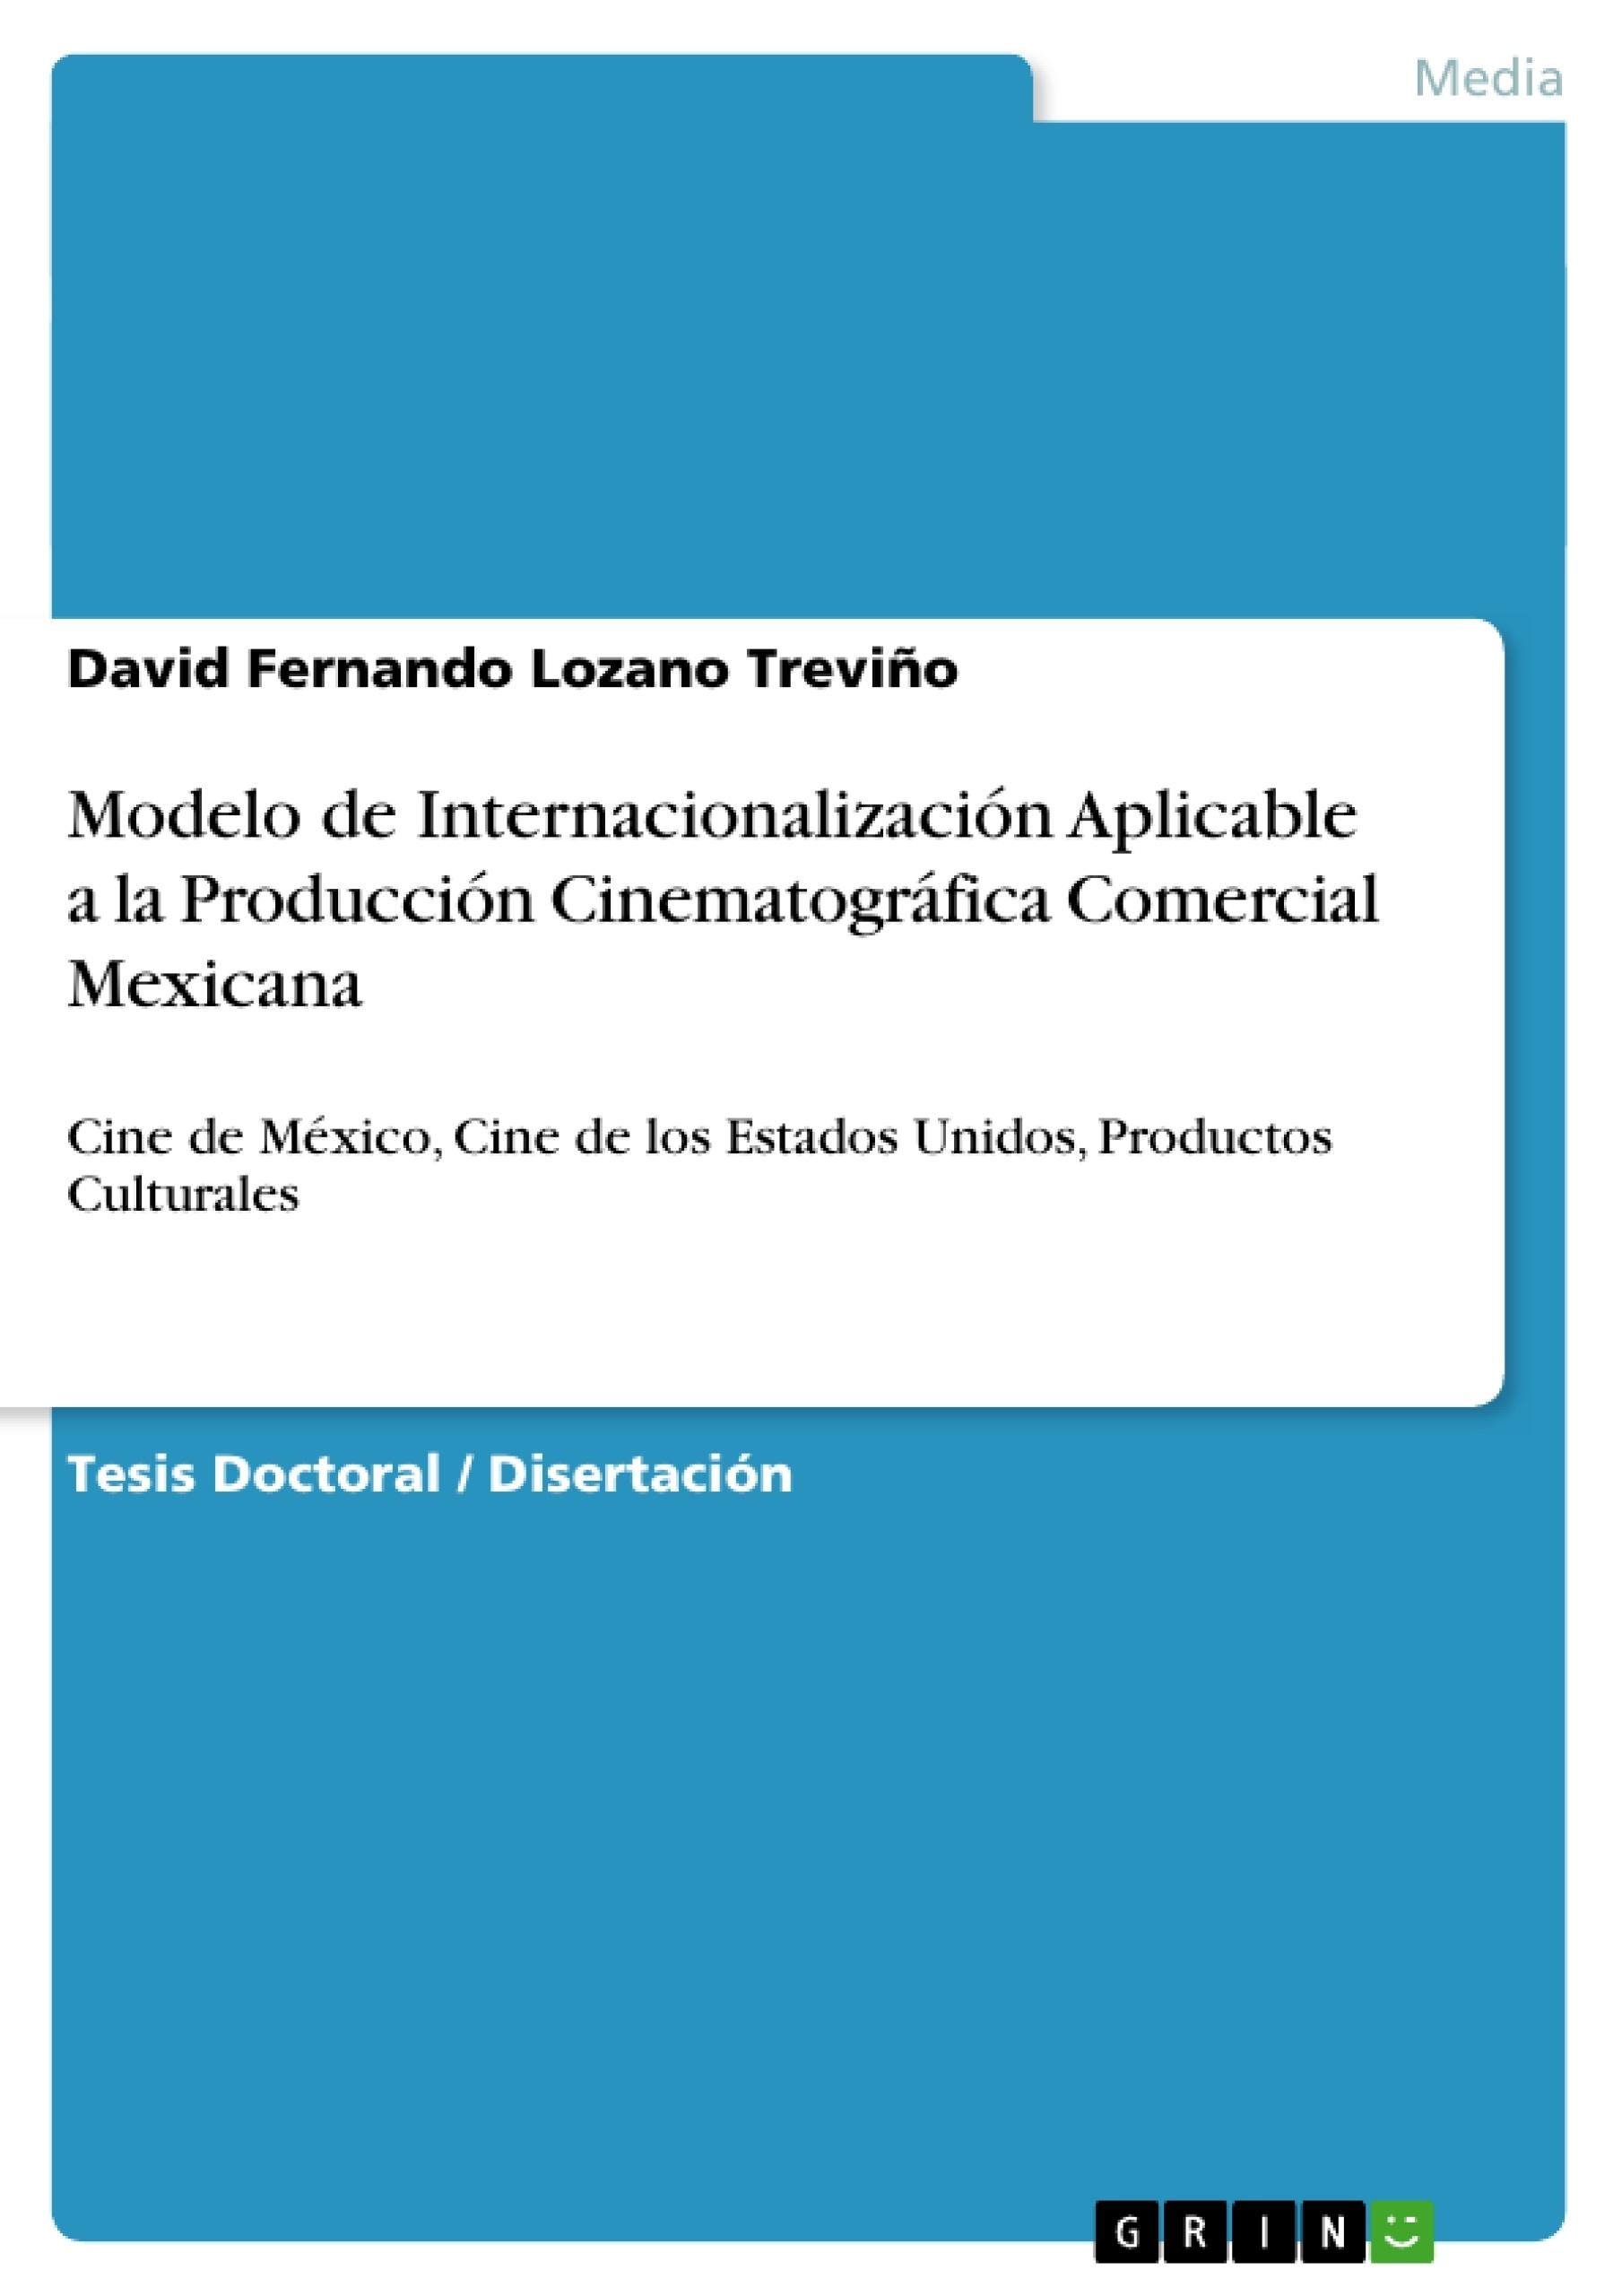 Título: Modelo de Internacionalización Aplicable a la Producción Cinematográfica Comercial Mexicana